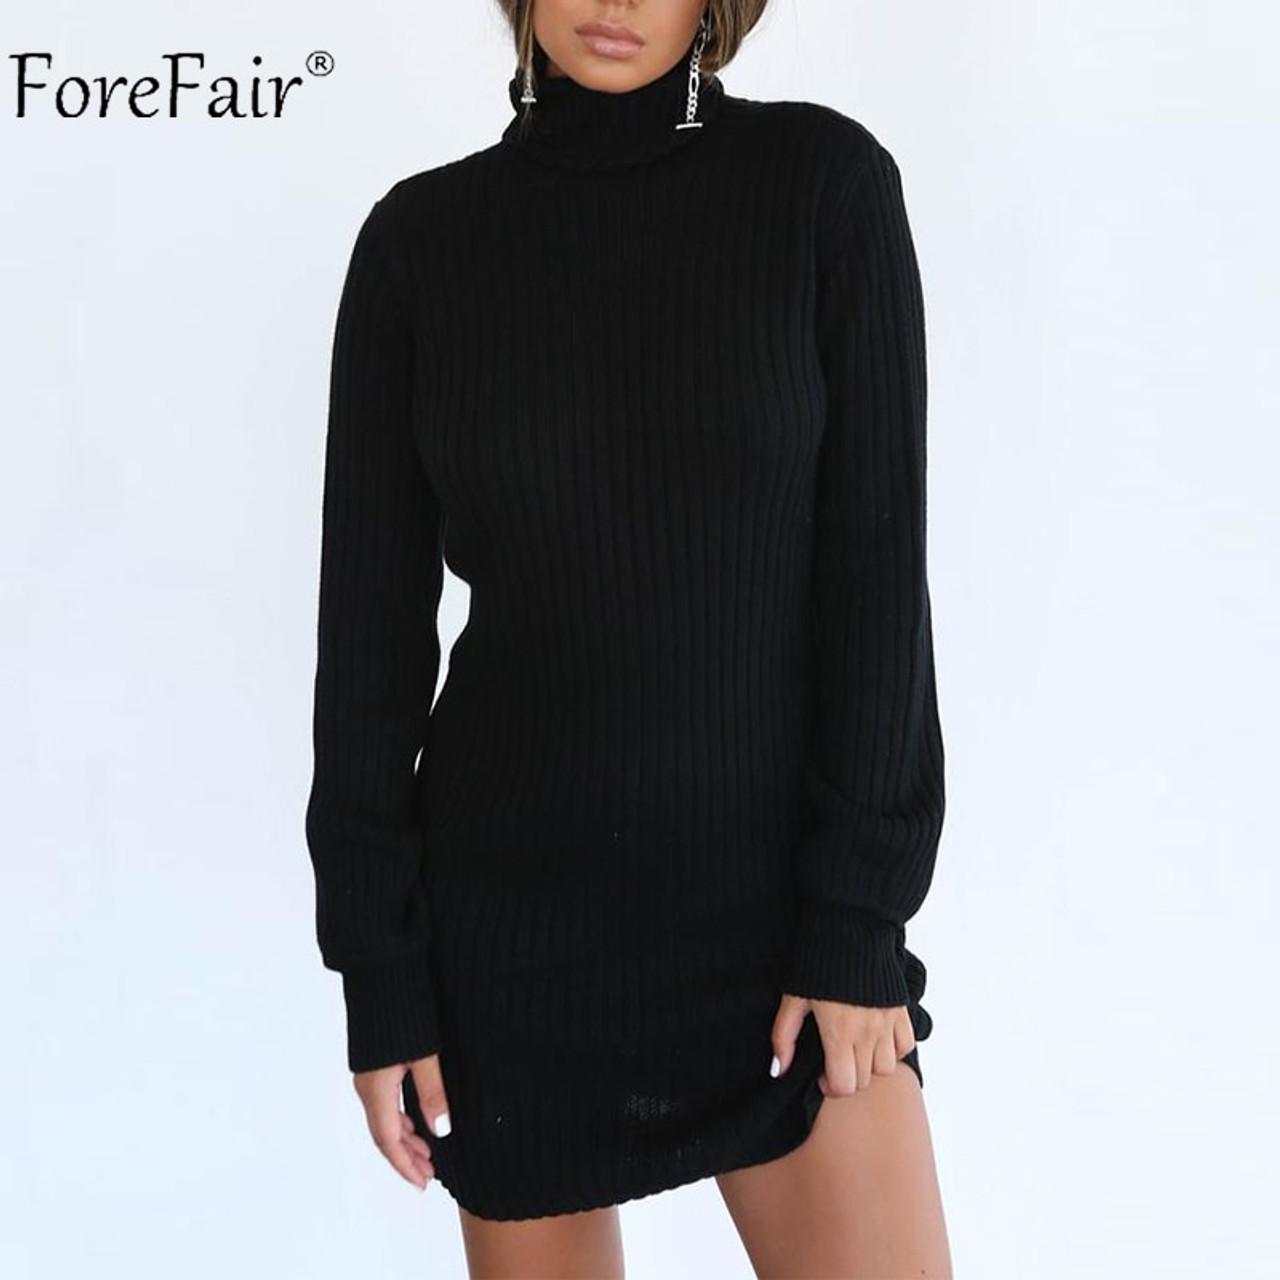 de646183528 ... Forefair Autumn Knitted Sweater Dress Women 2018 Ladies Turtleneck Sexy  Dress Noodles Female Long Sleeve Winter ...